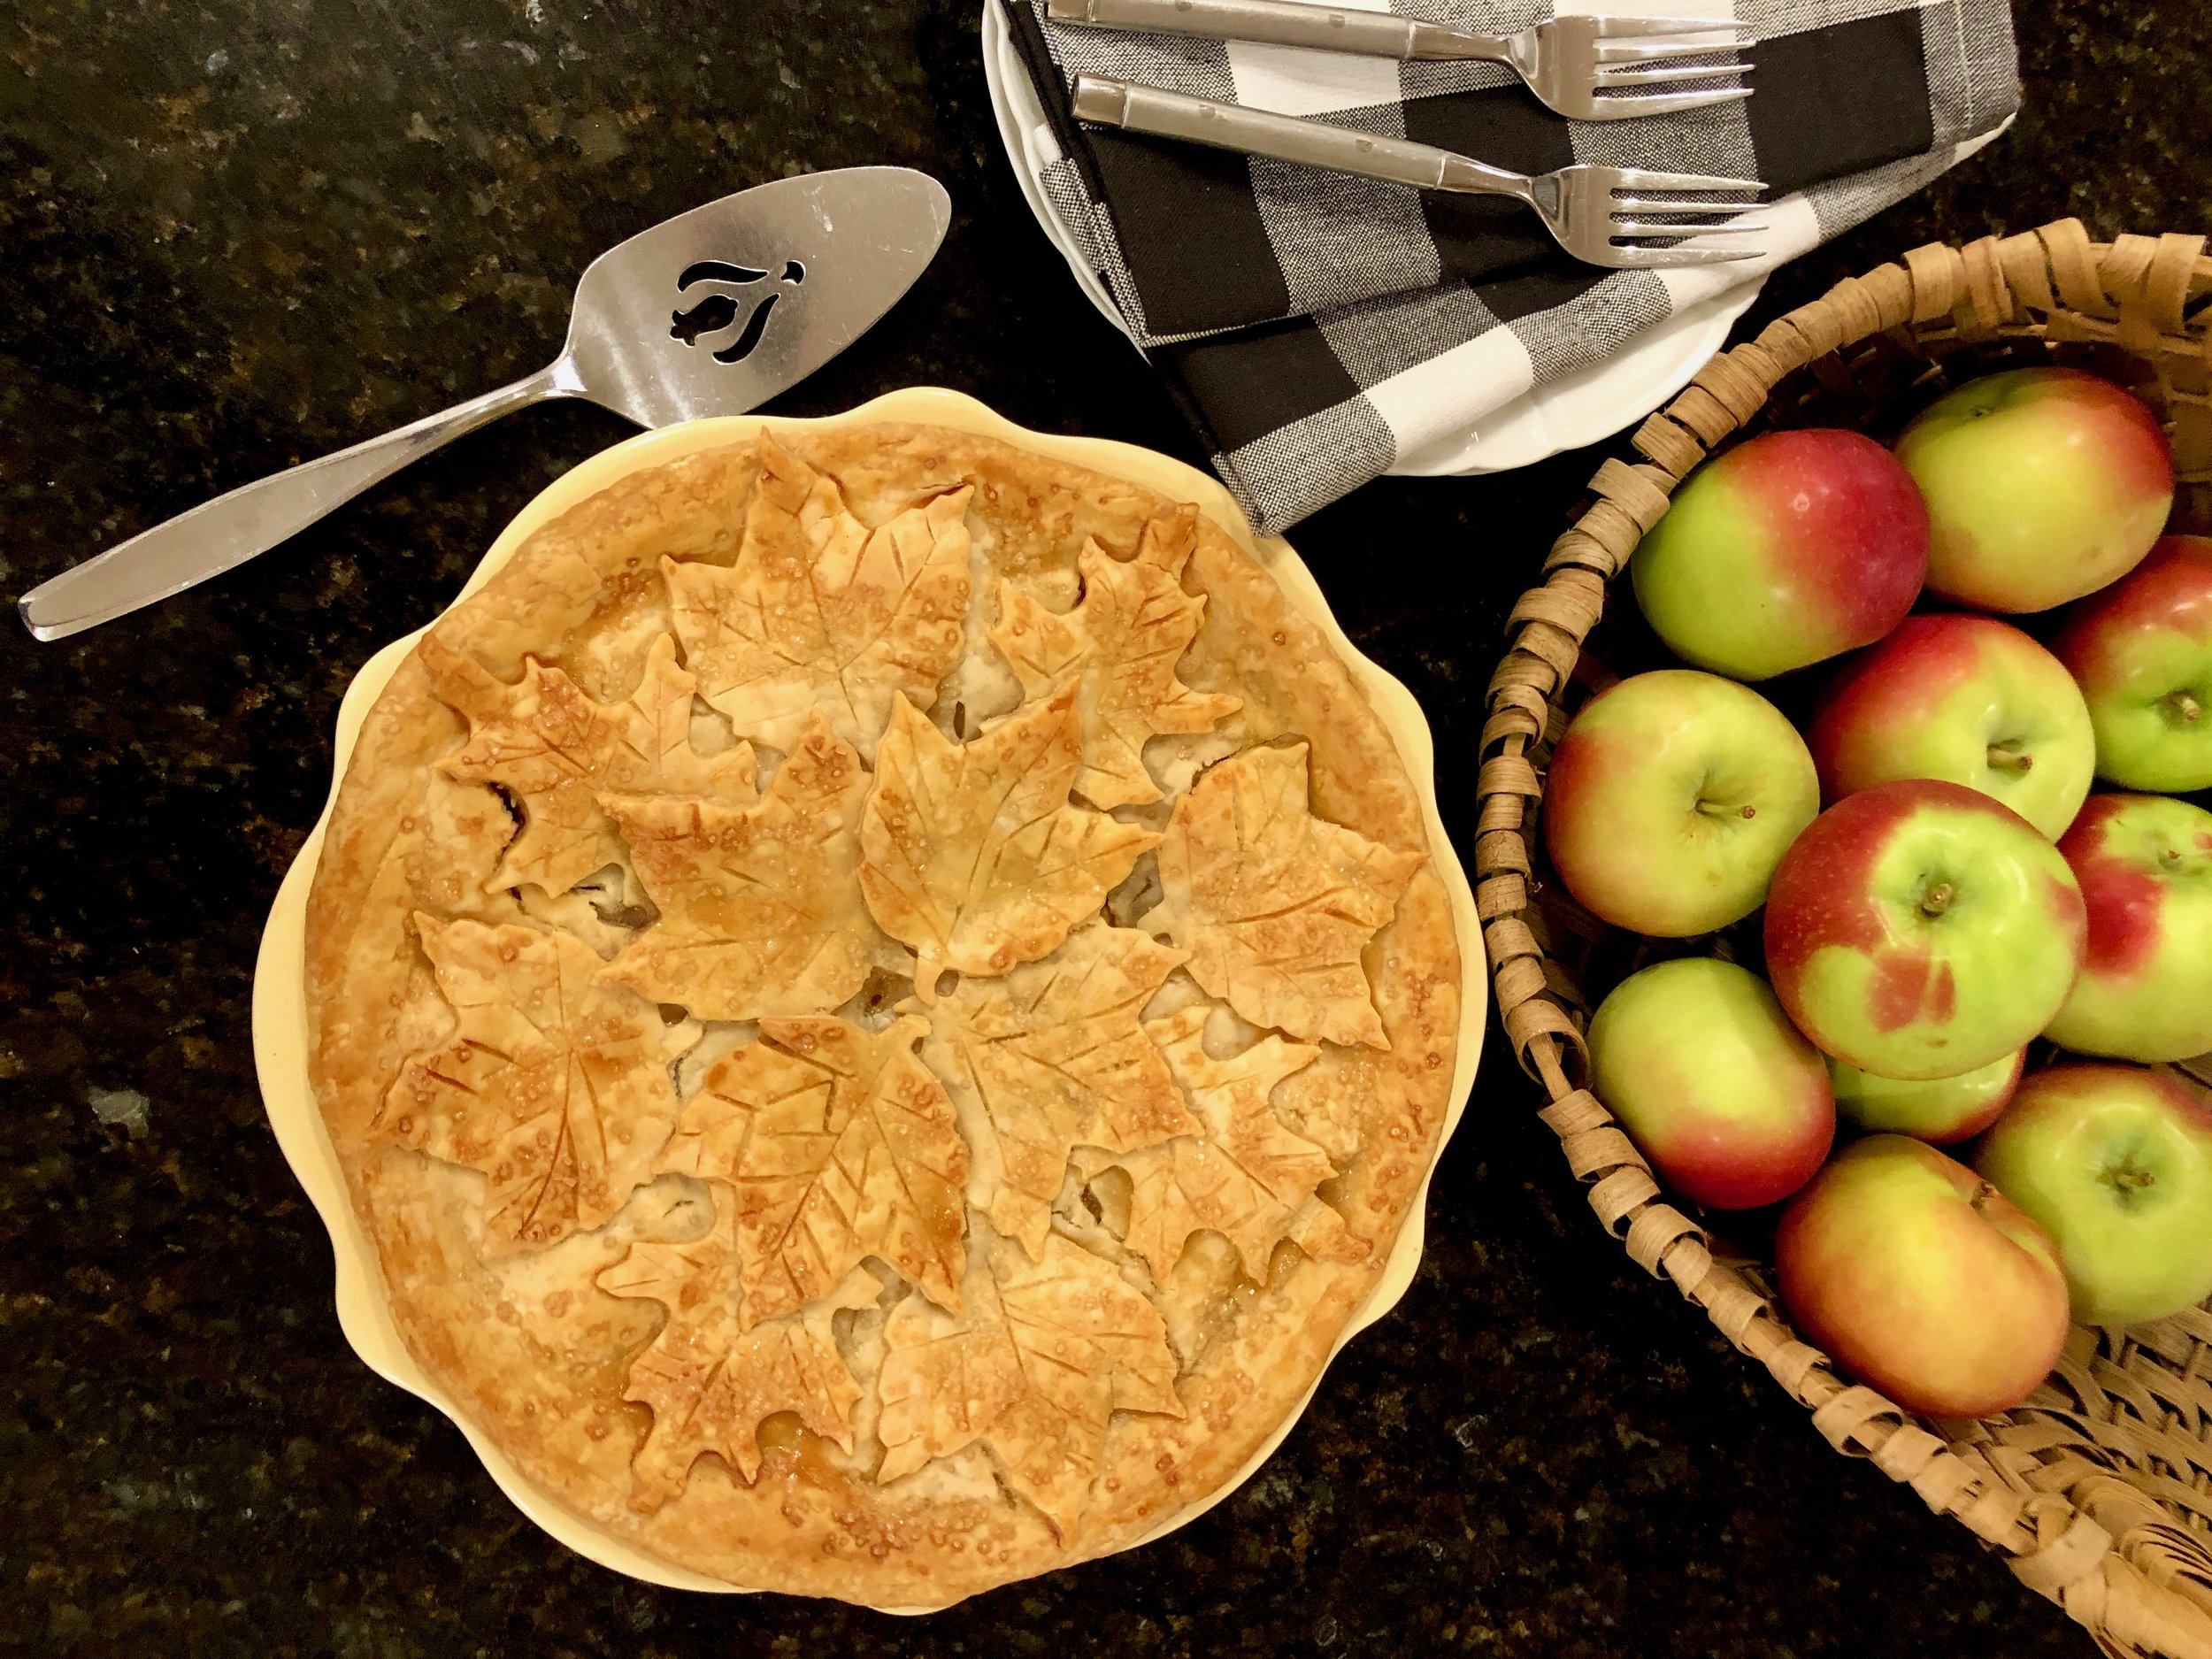 Apple pie flatly